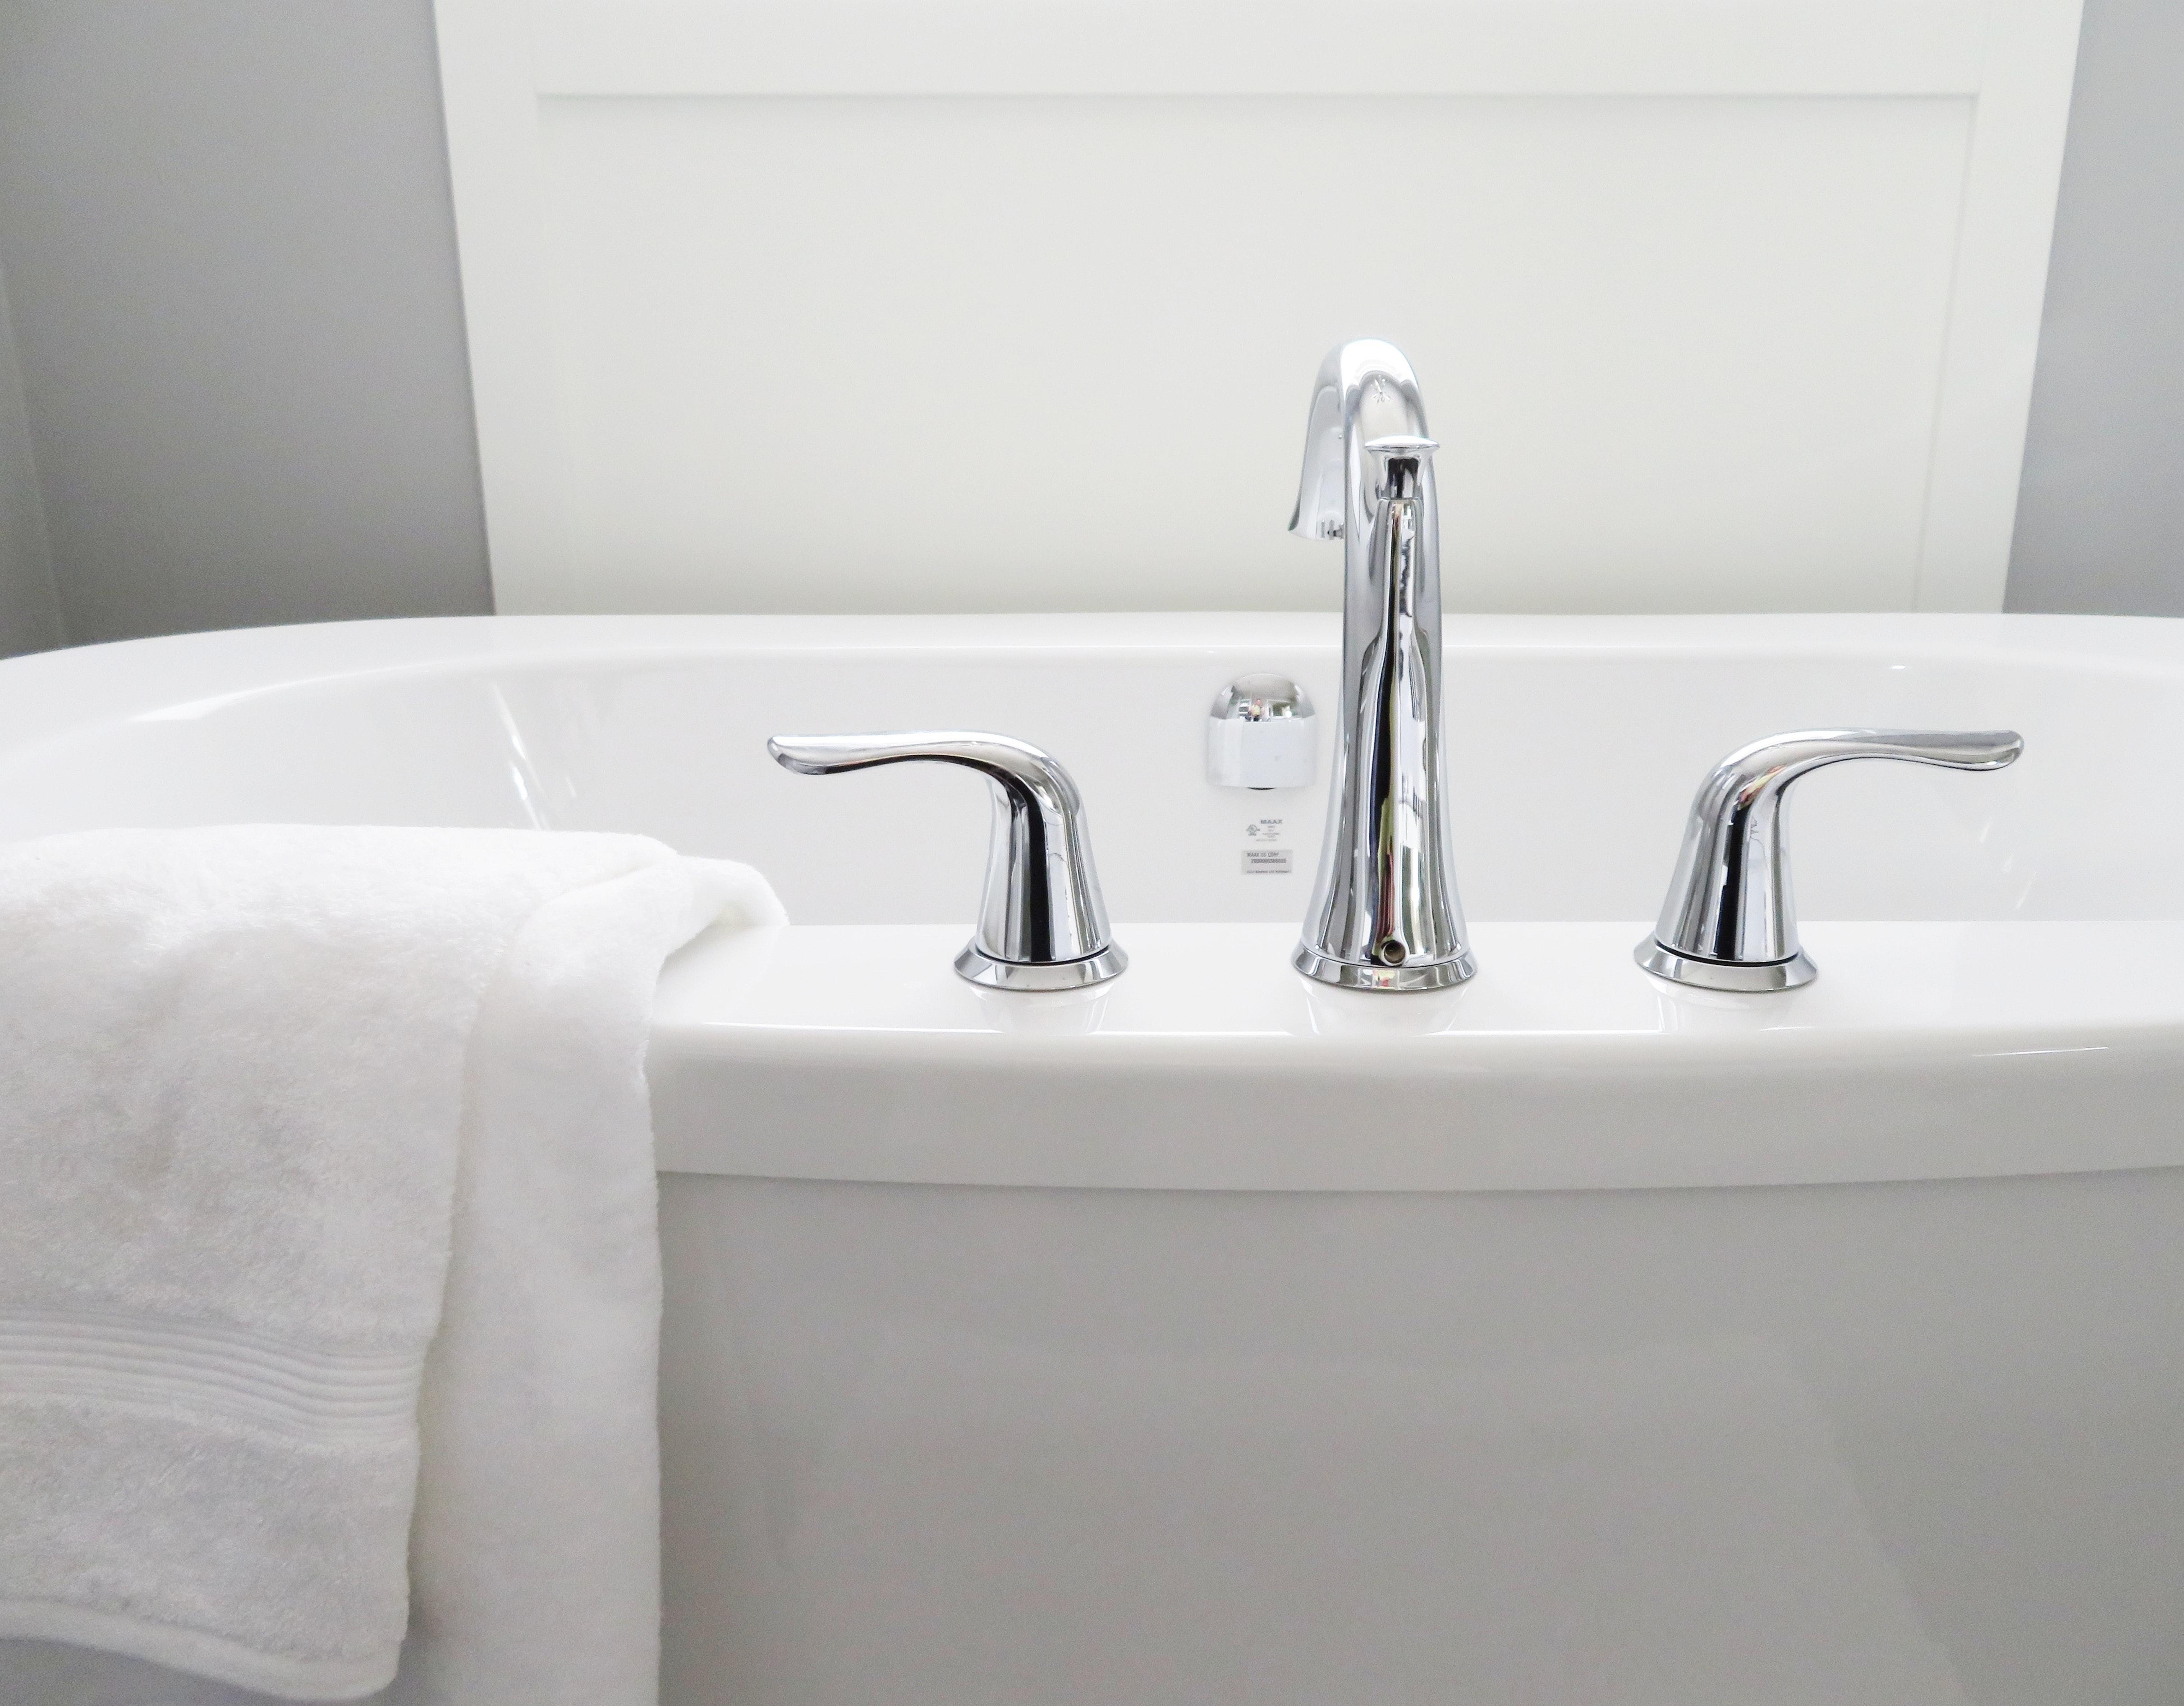 20+ Engaging Bathtub Photos · Pexels · Free Stock Photos